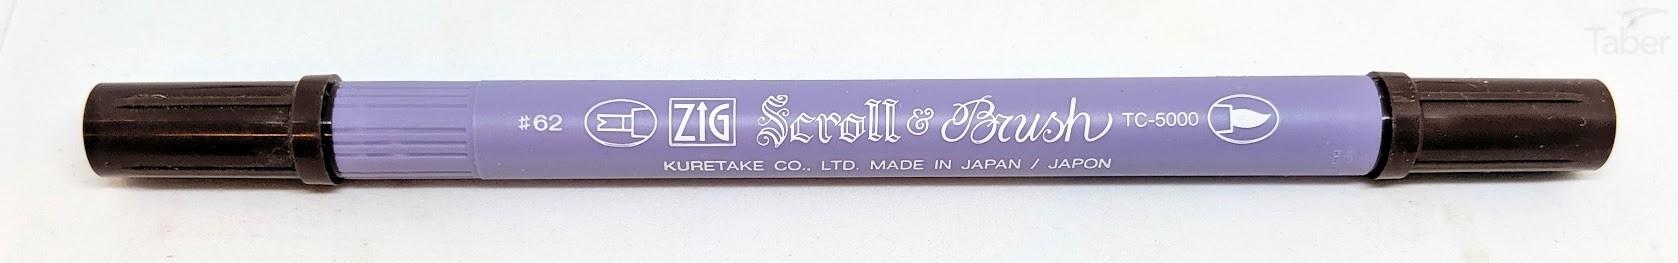 Zig Scroll and Brush Marker, Chocolate